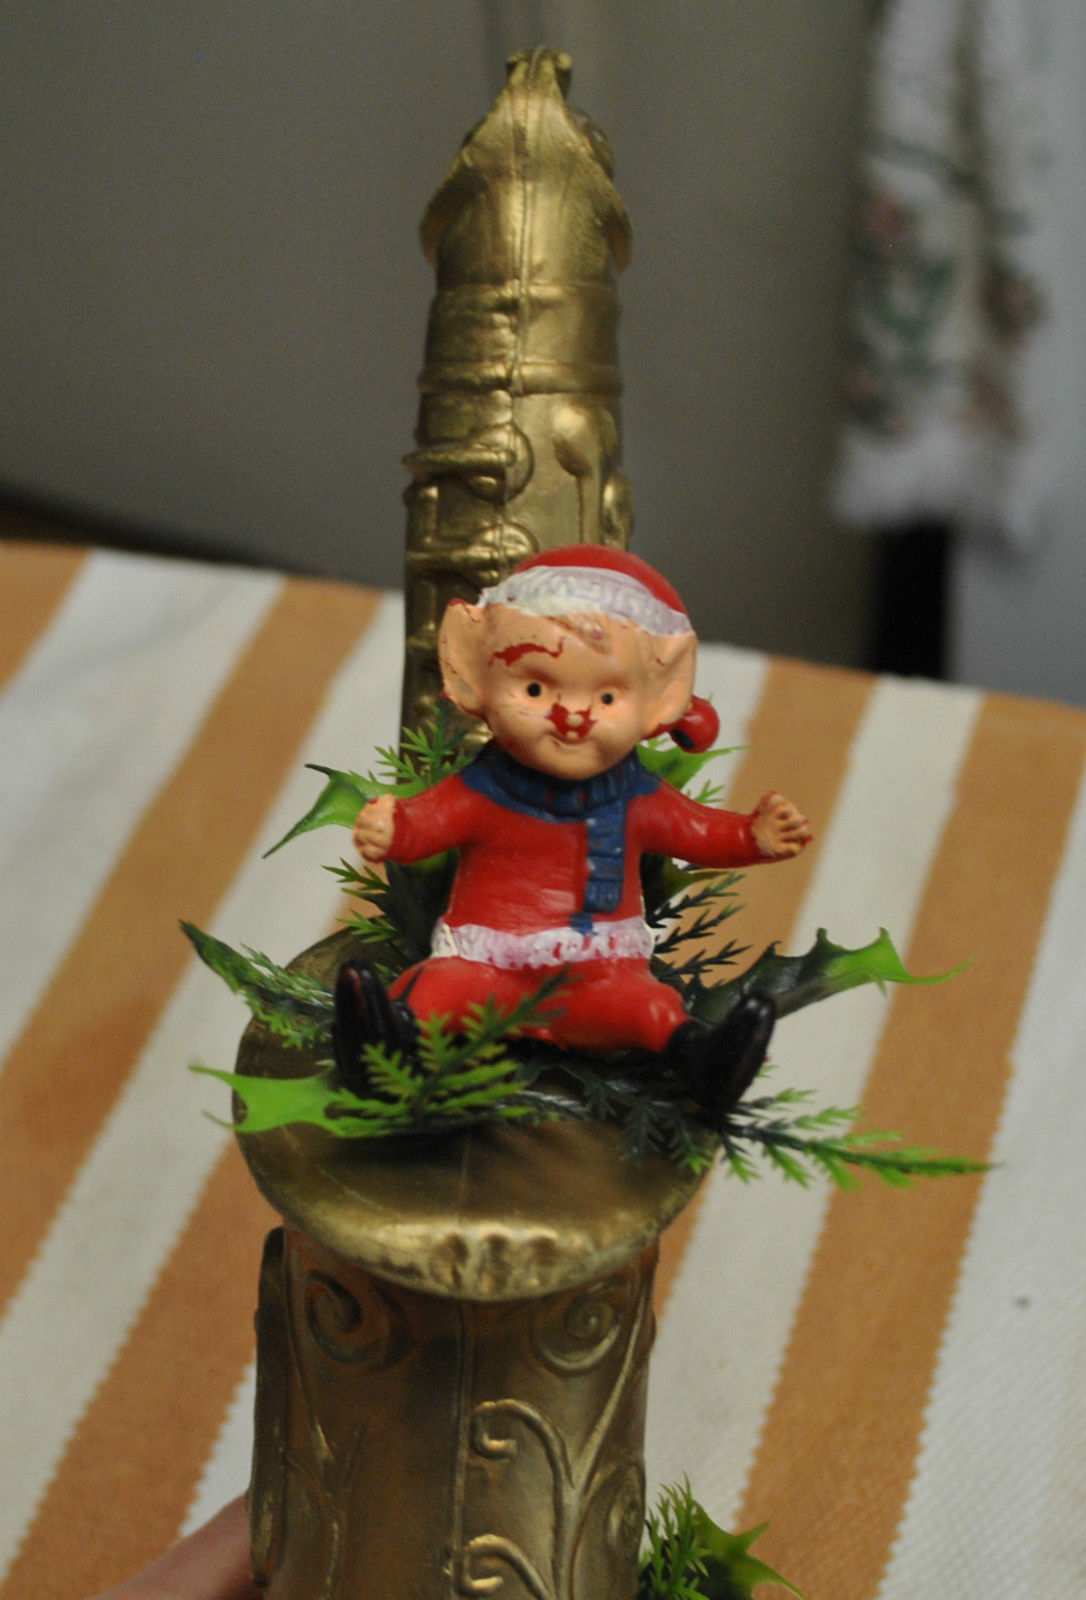 plastic holiday decoration, saxophone Christmas decoration, elf, mid-century Christmas decor, saxy Christmas kitsch